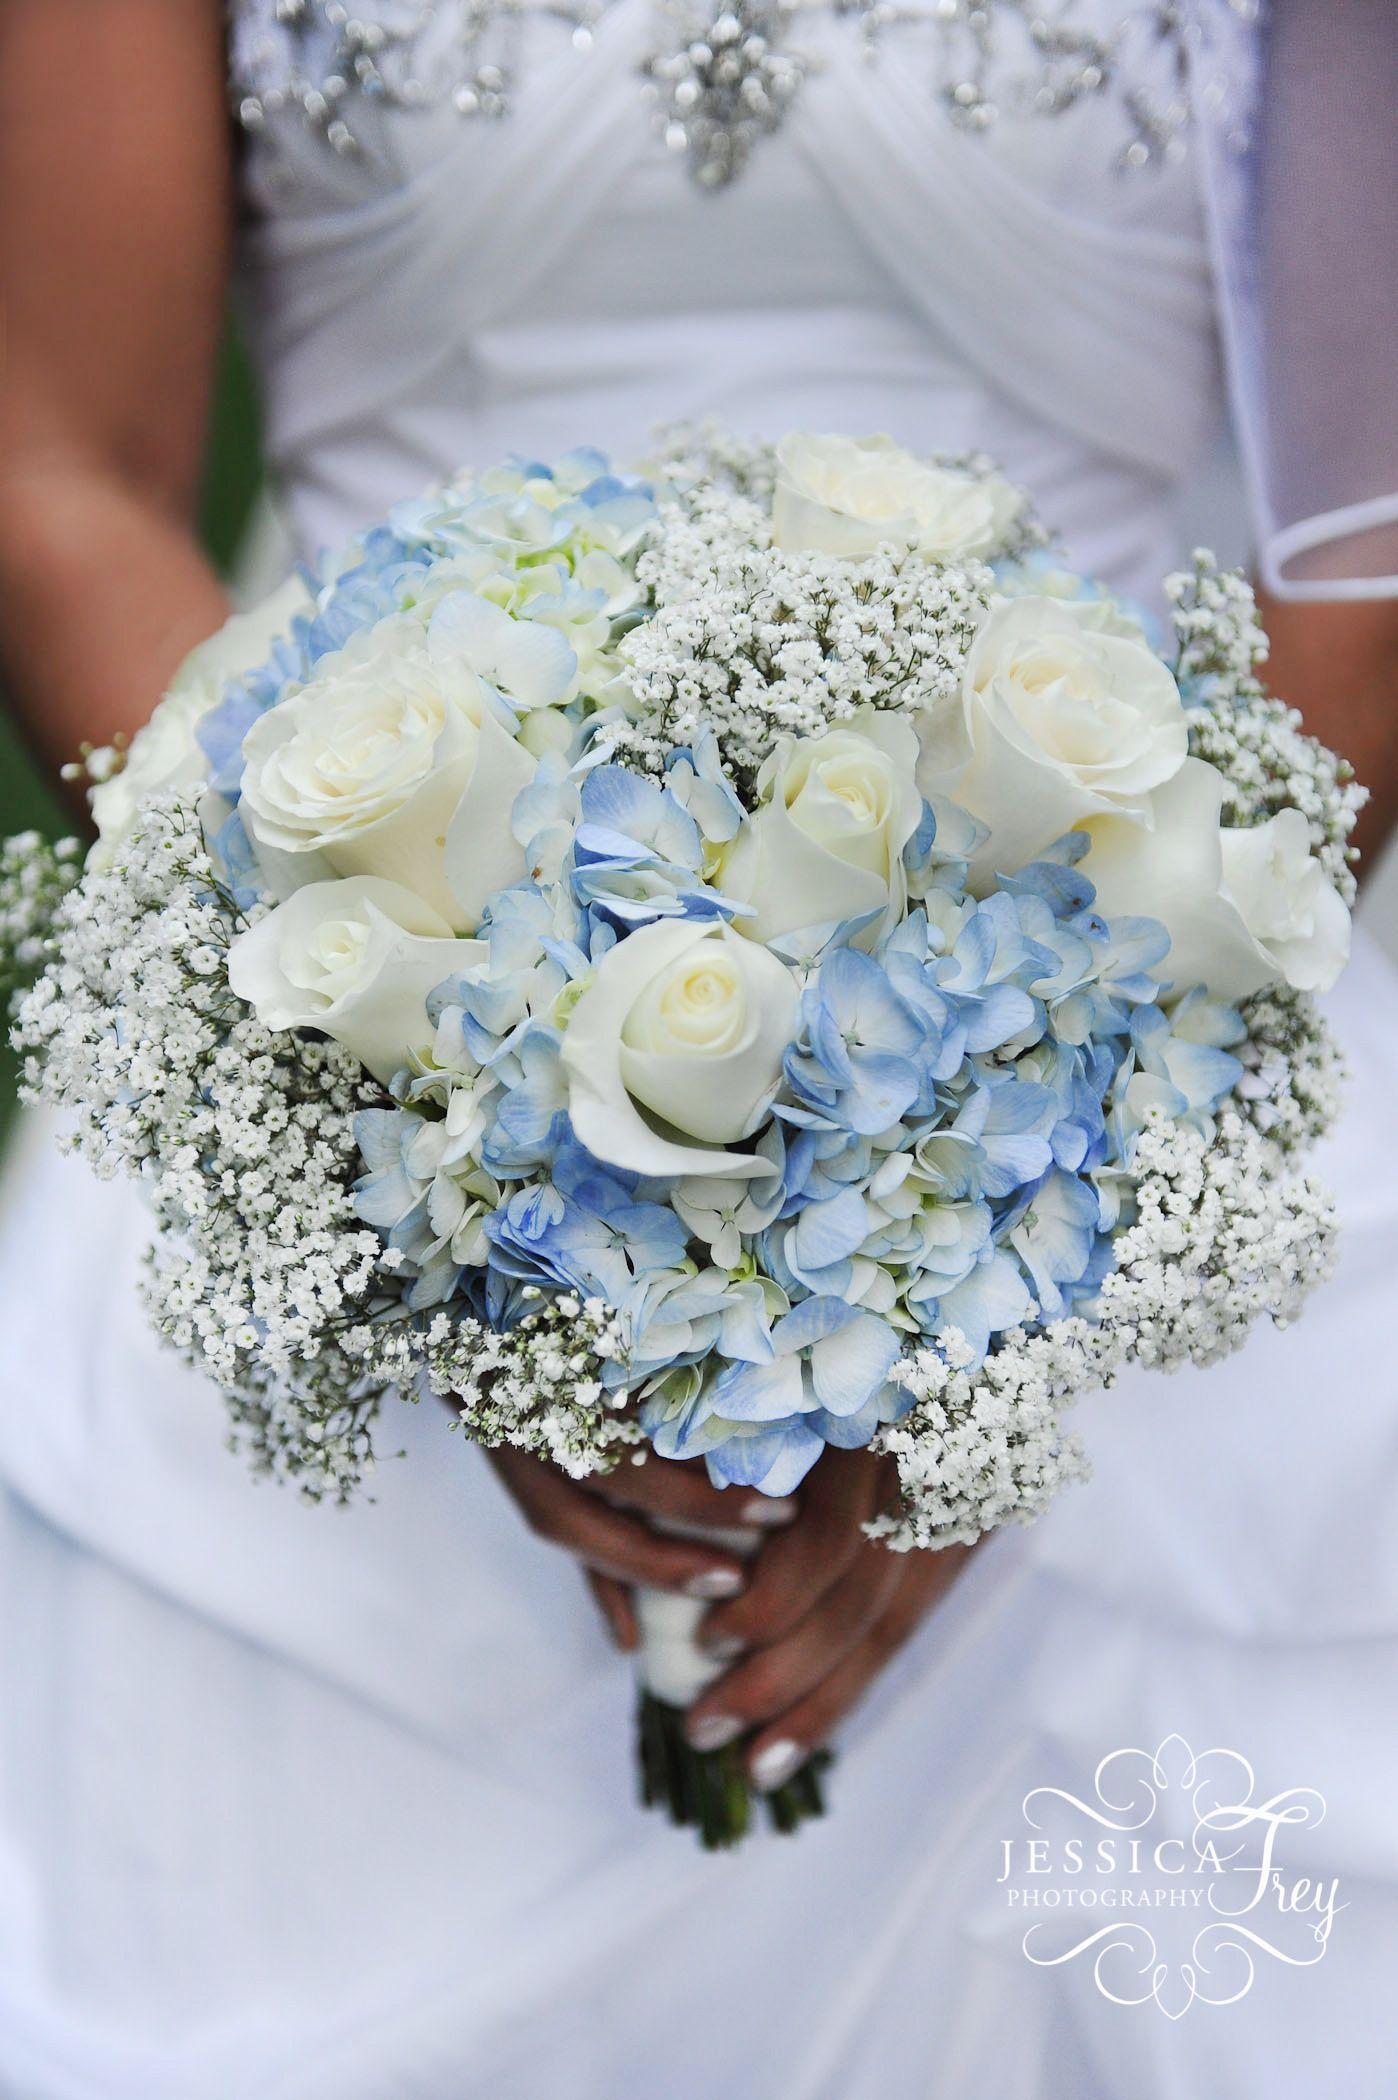 wedding bouquets 2014 wedding party bridal bouquet flower ideas february 4 2014 weddings. Black Bedroom Furniture Sets. Home Design Ideas